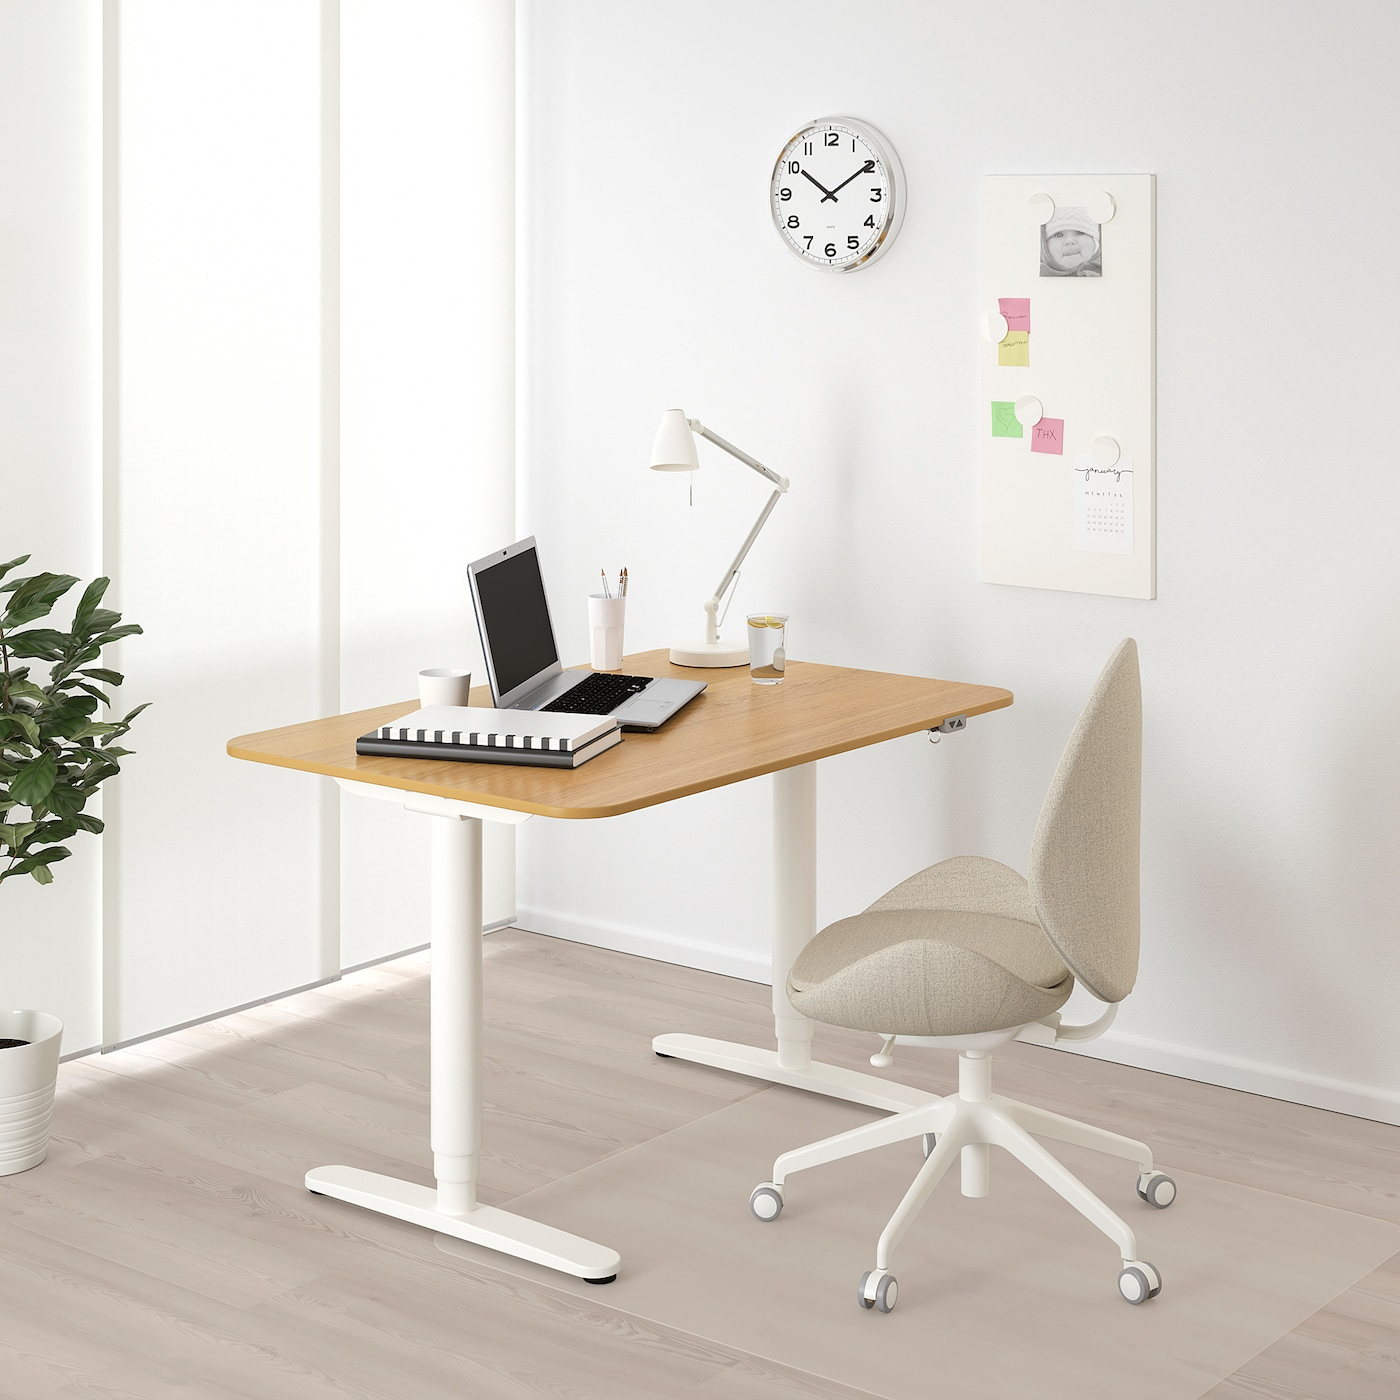 BEKANT Desk sit/stand, oak veneer/white, 120x80 cm